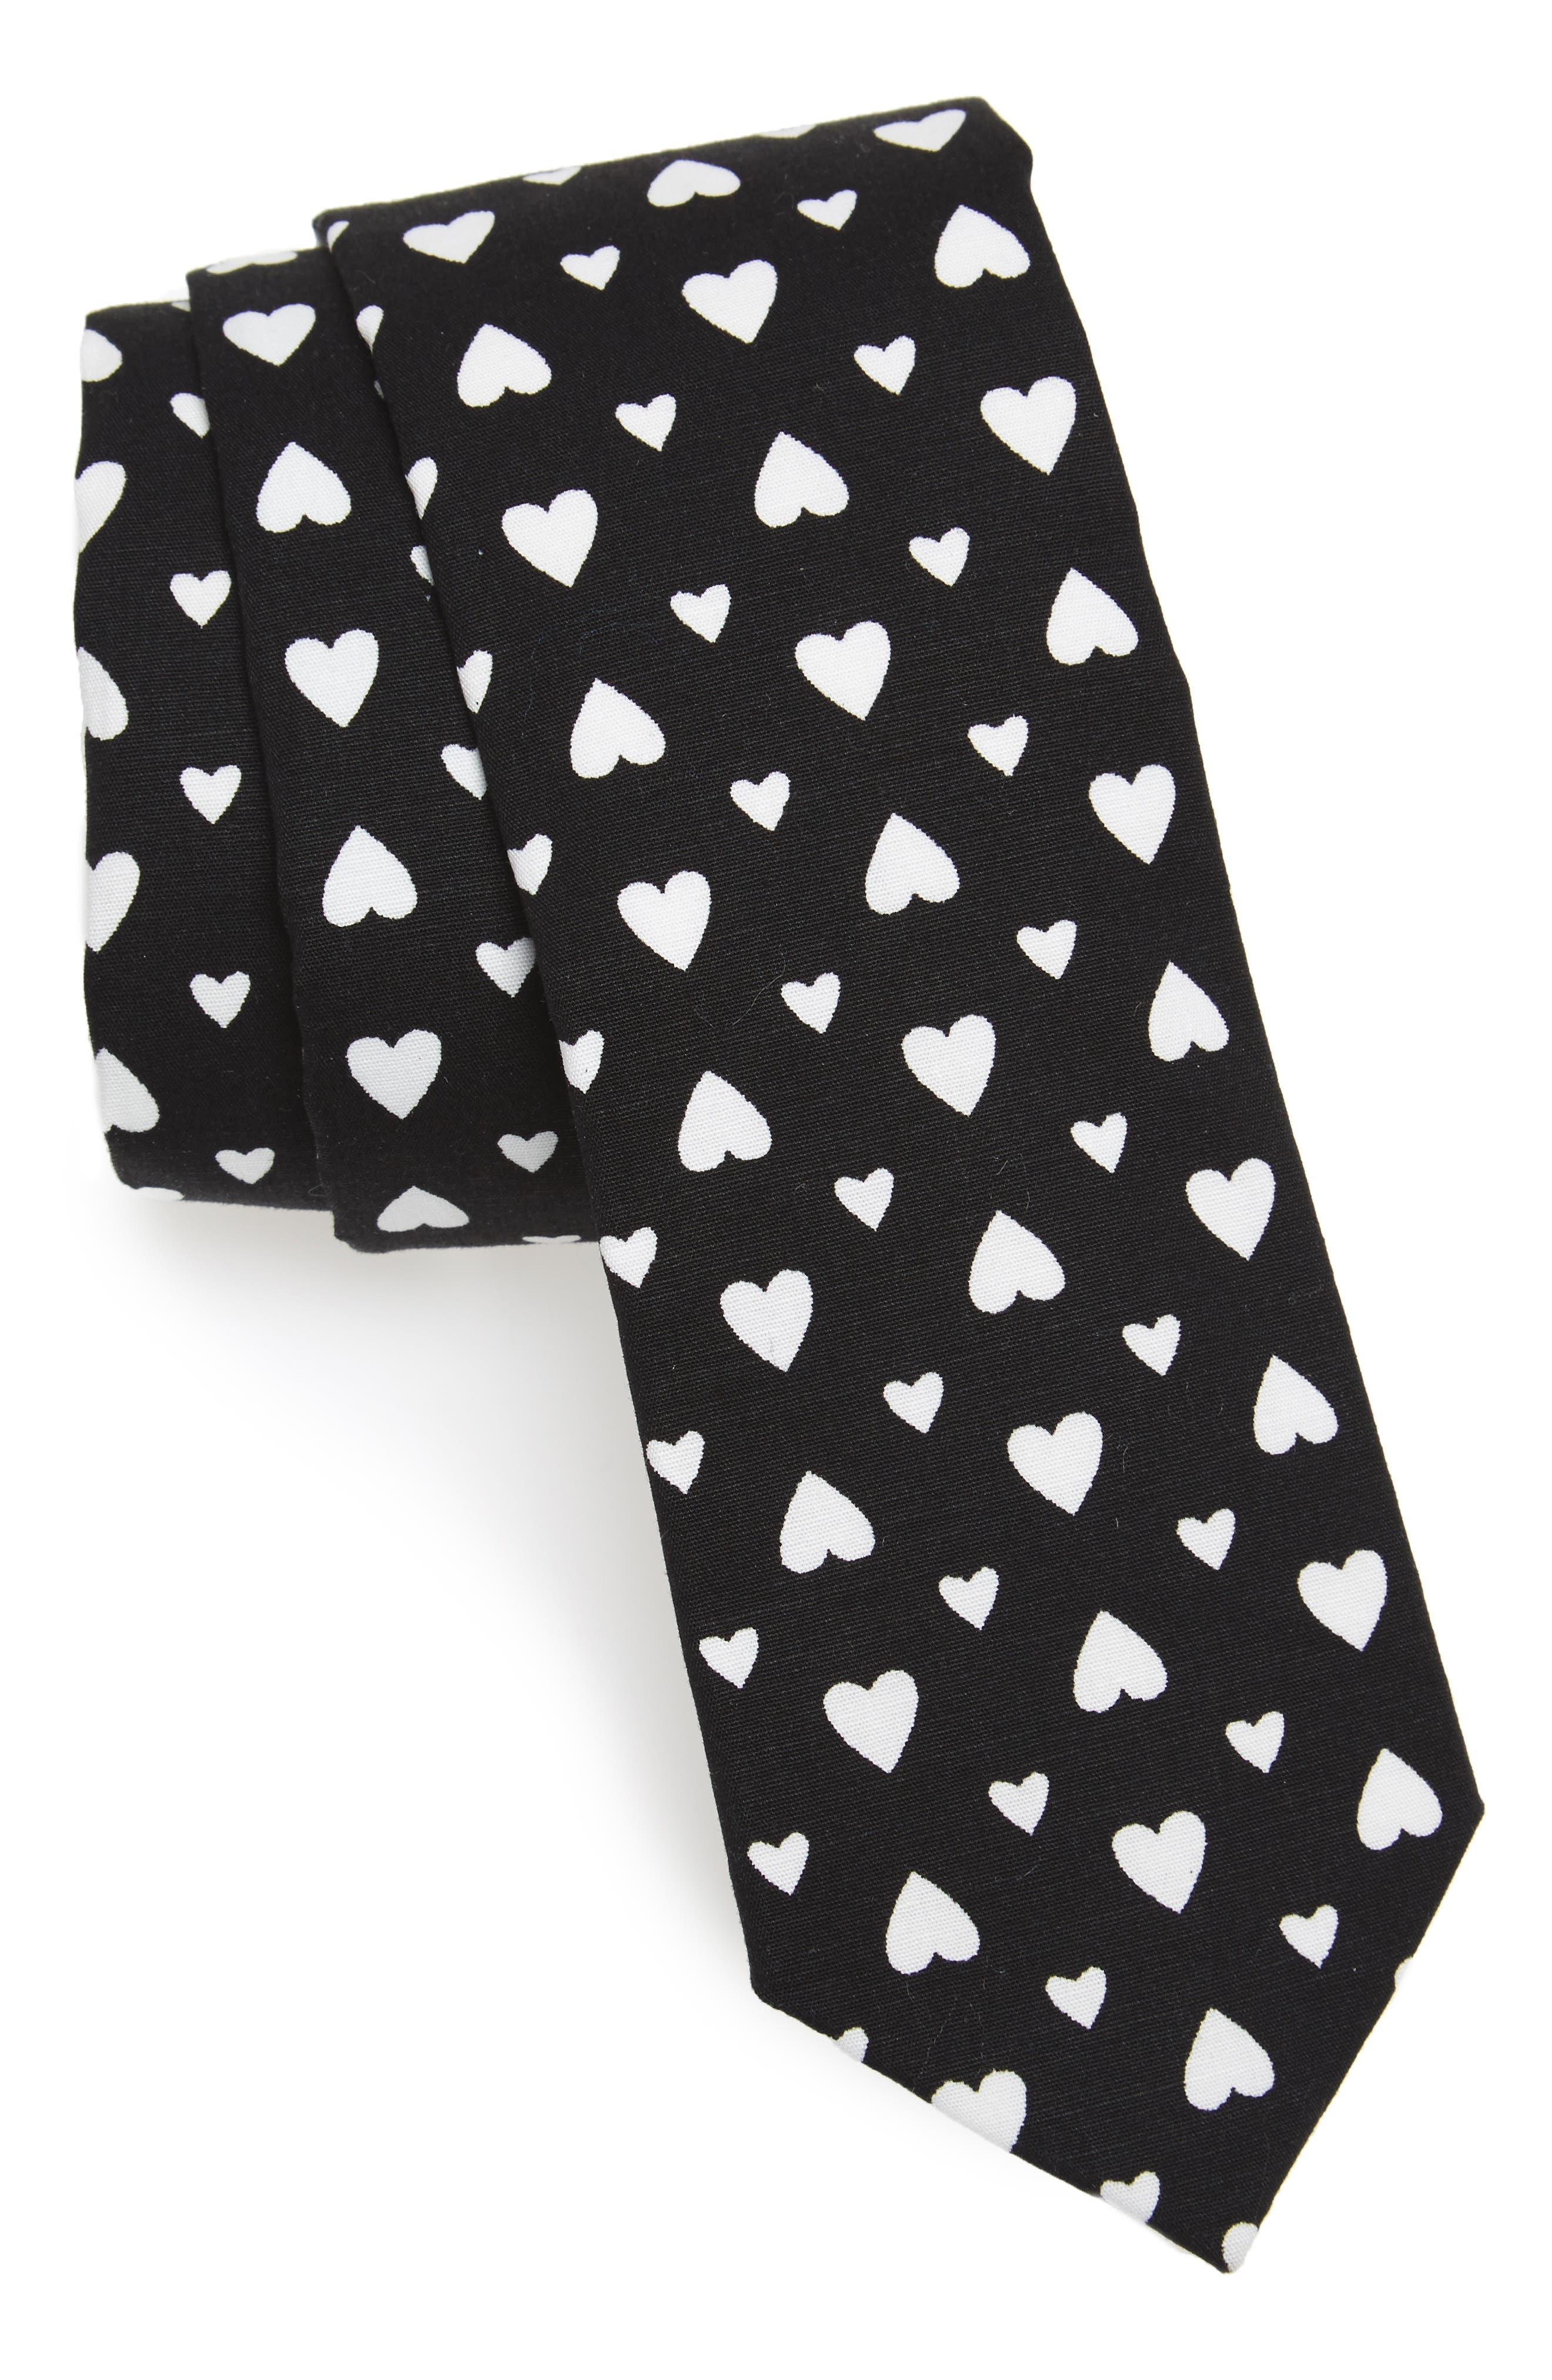 Alternate Image 1 Selected - 1901 Hearts Print Skinny Tie